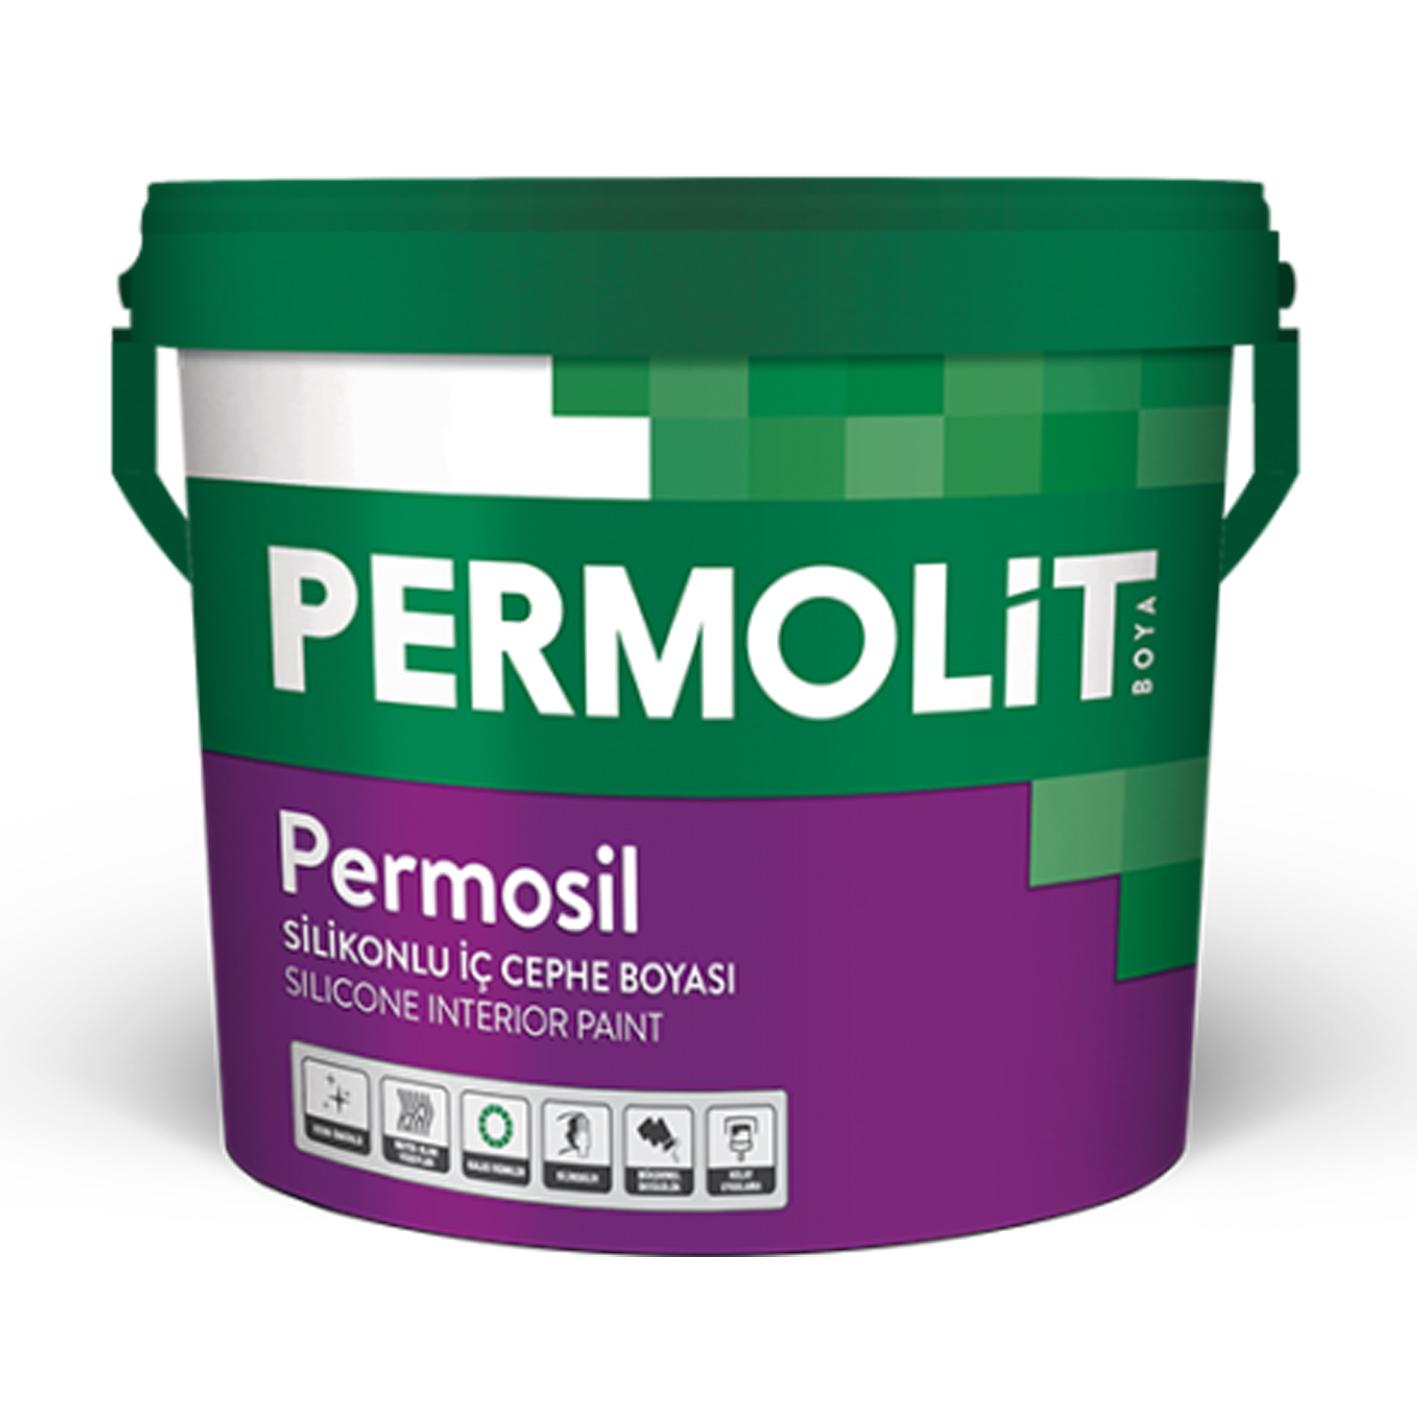 Permolit Permosil İç Cephe Beyaz Baz 10Kg